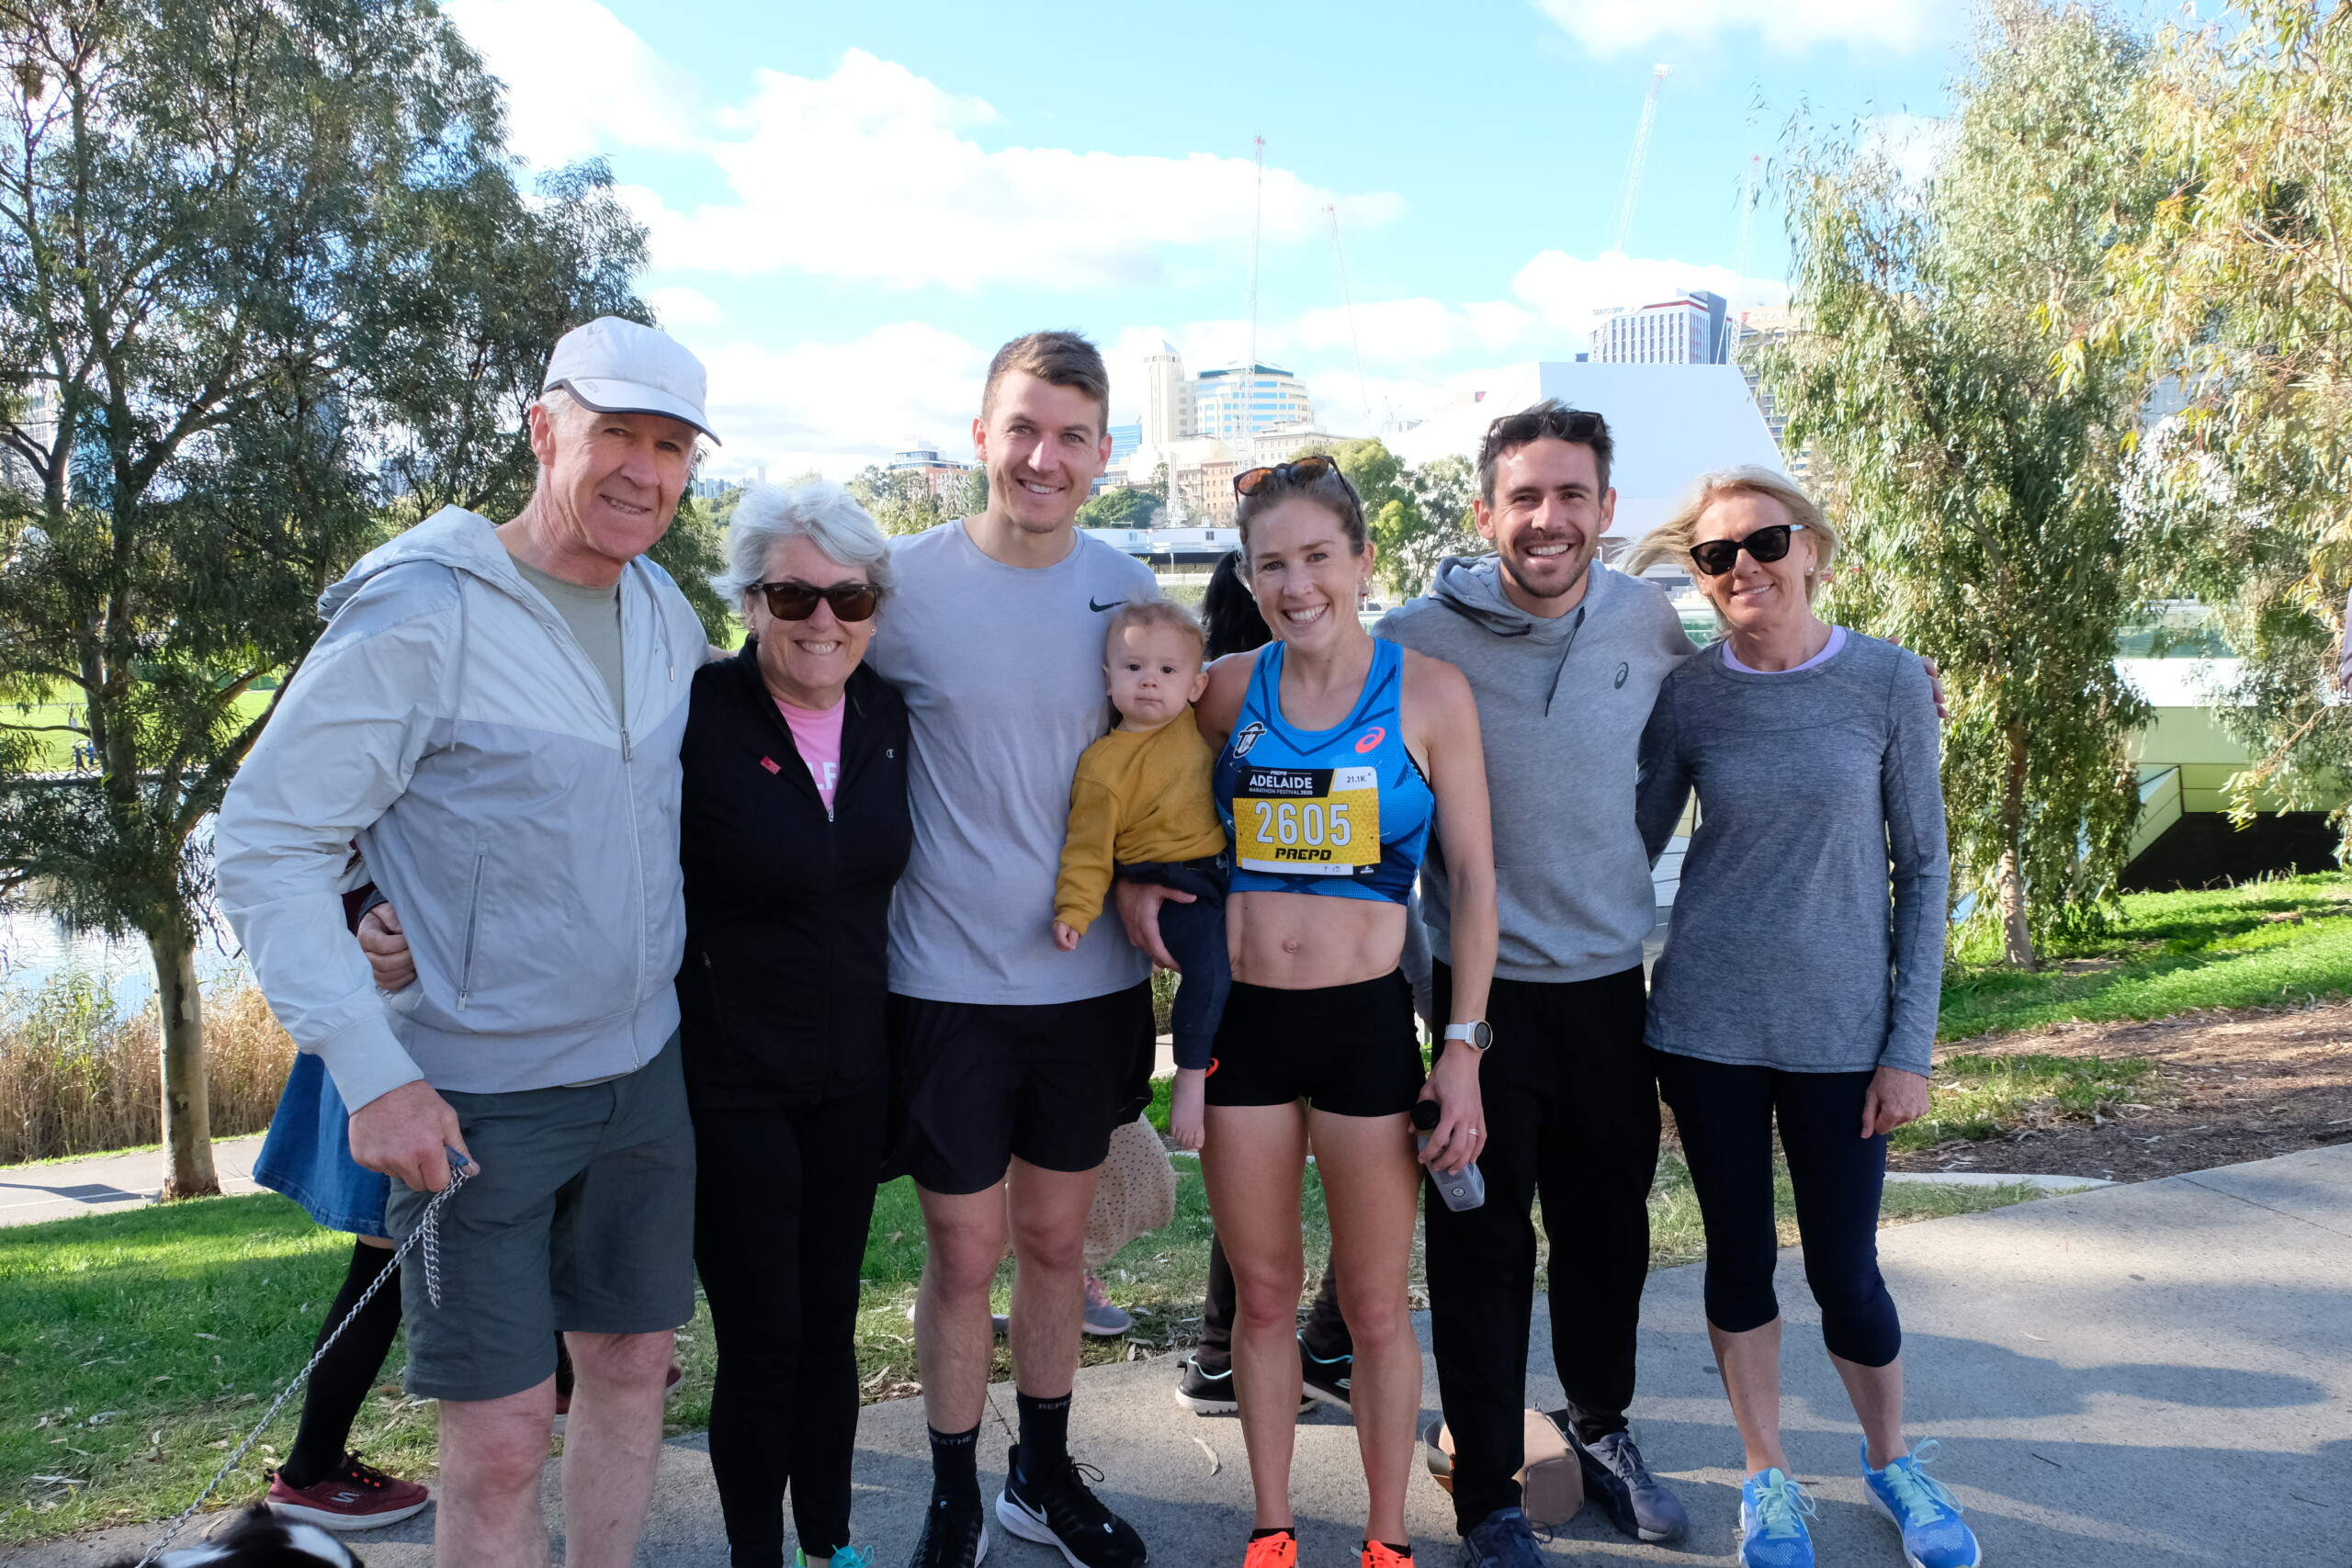 2020 Adelaide Half Marathon recap by Jessica Stenson (née Trengove)